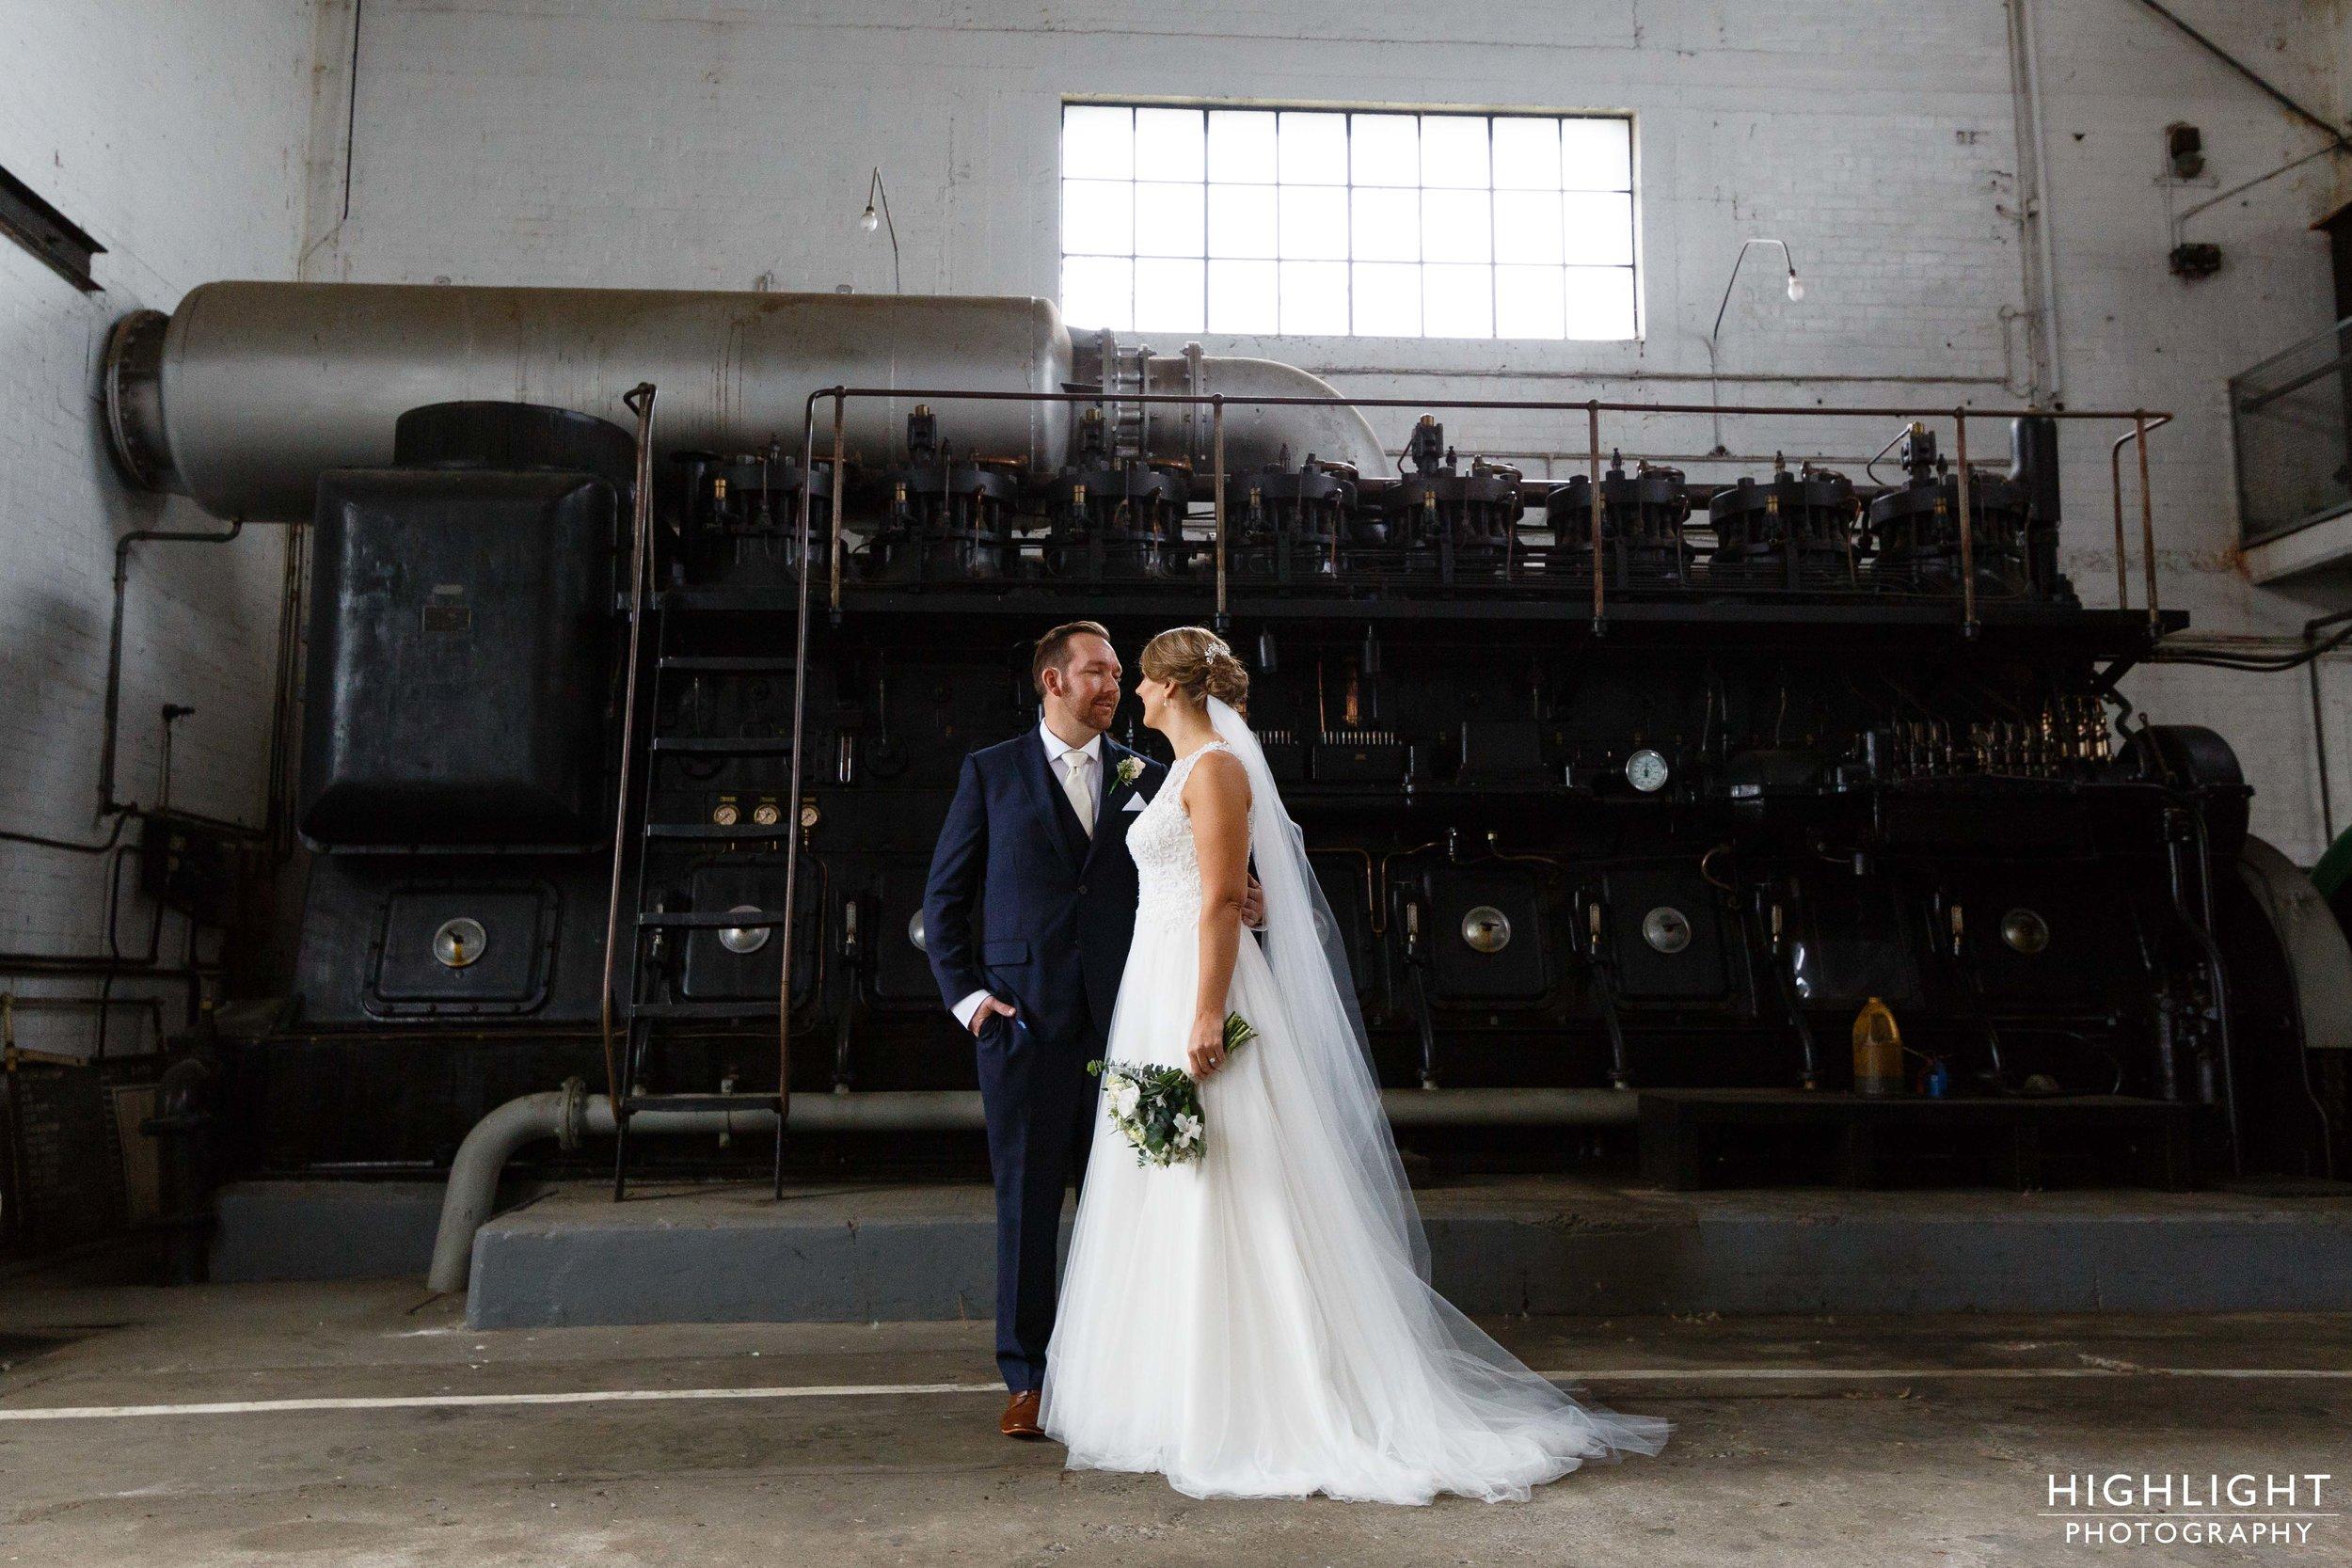 highlight-wedding-photography-palmerston-north-new-zealand-orlando-country-club-wedding-66.jpg